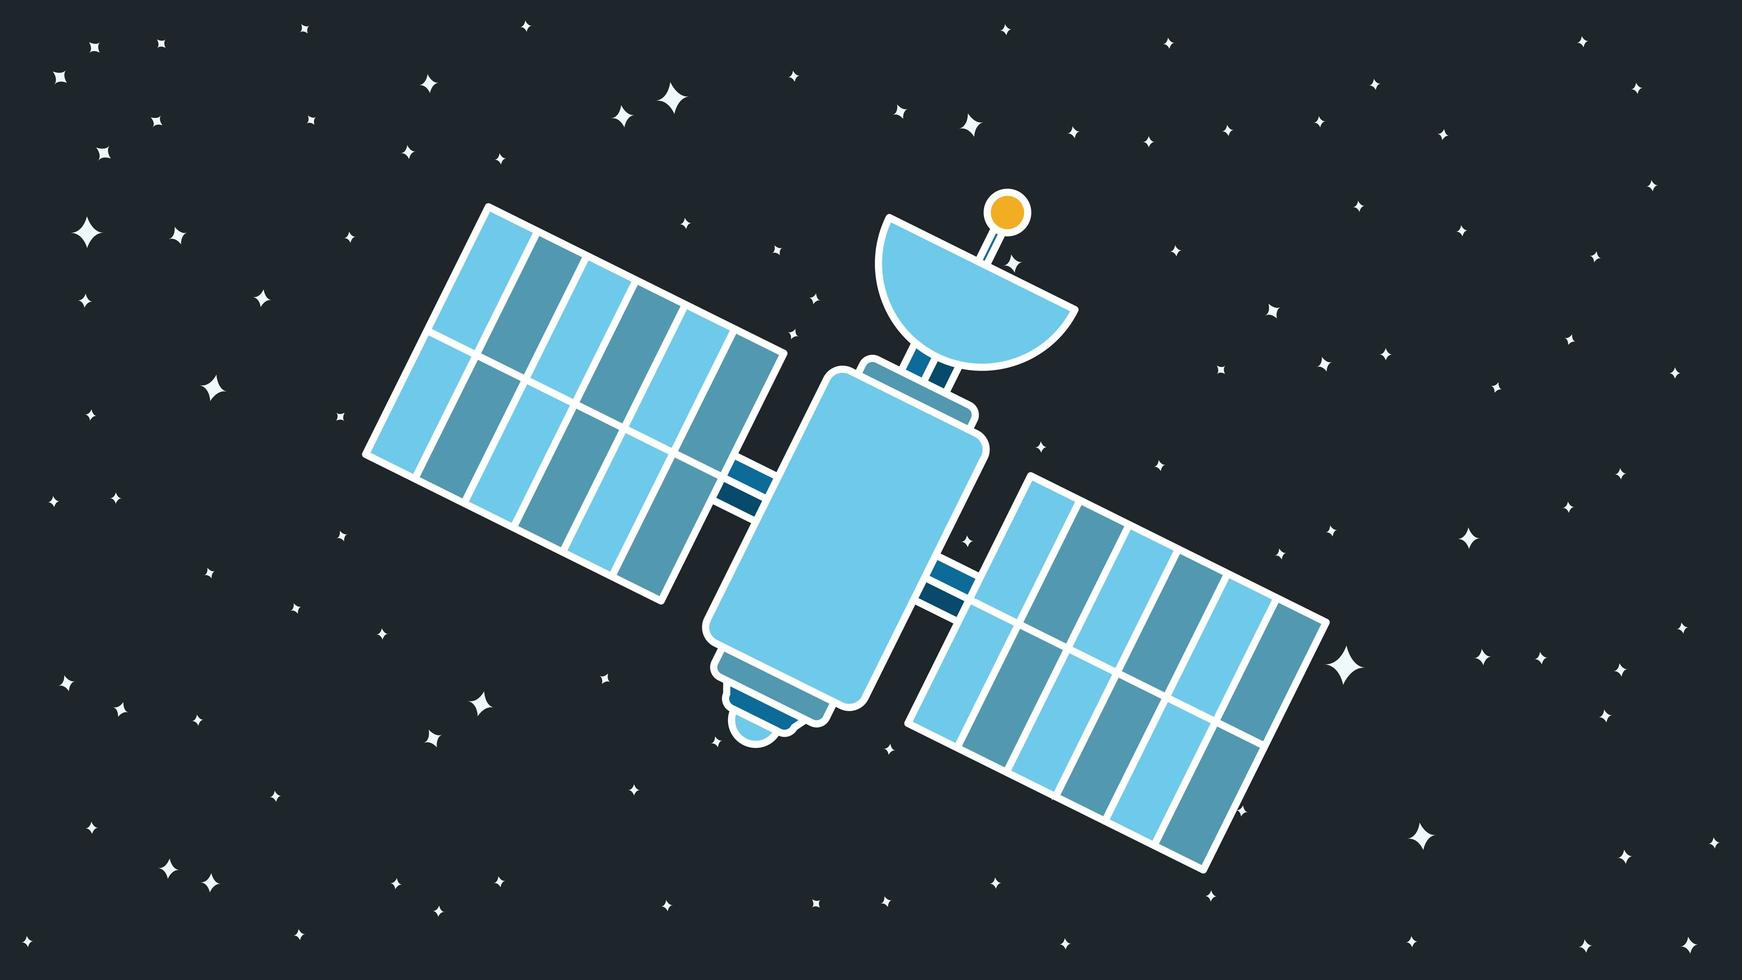 satélite cosmos moderno vetor